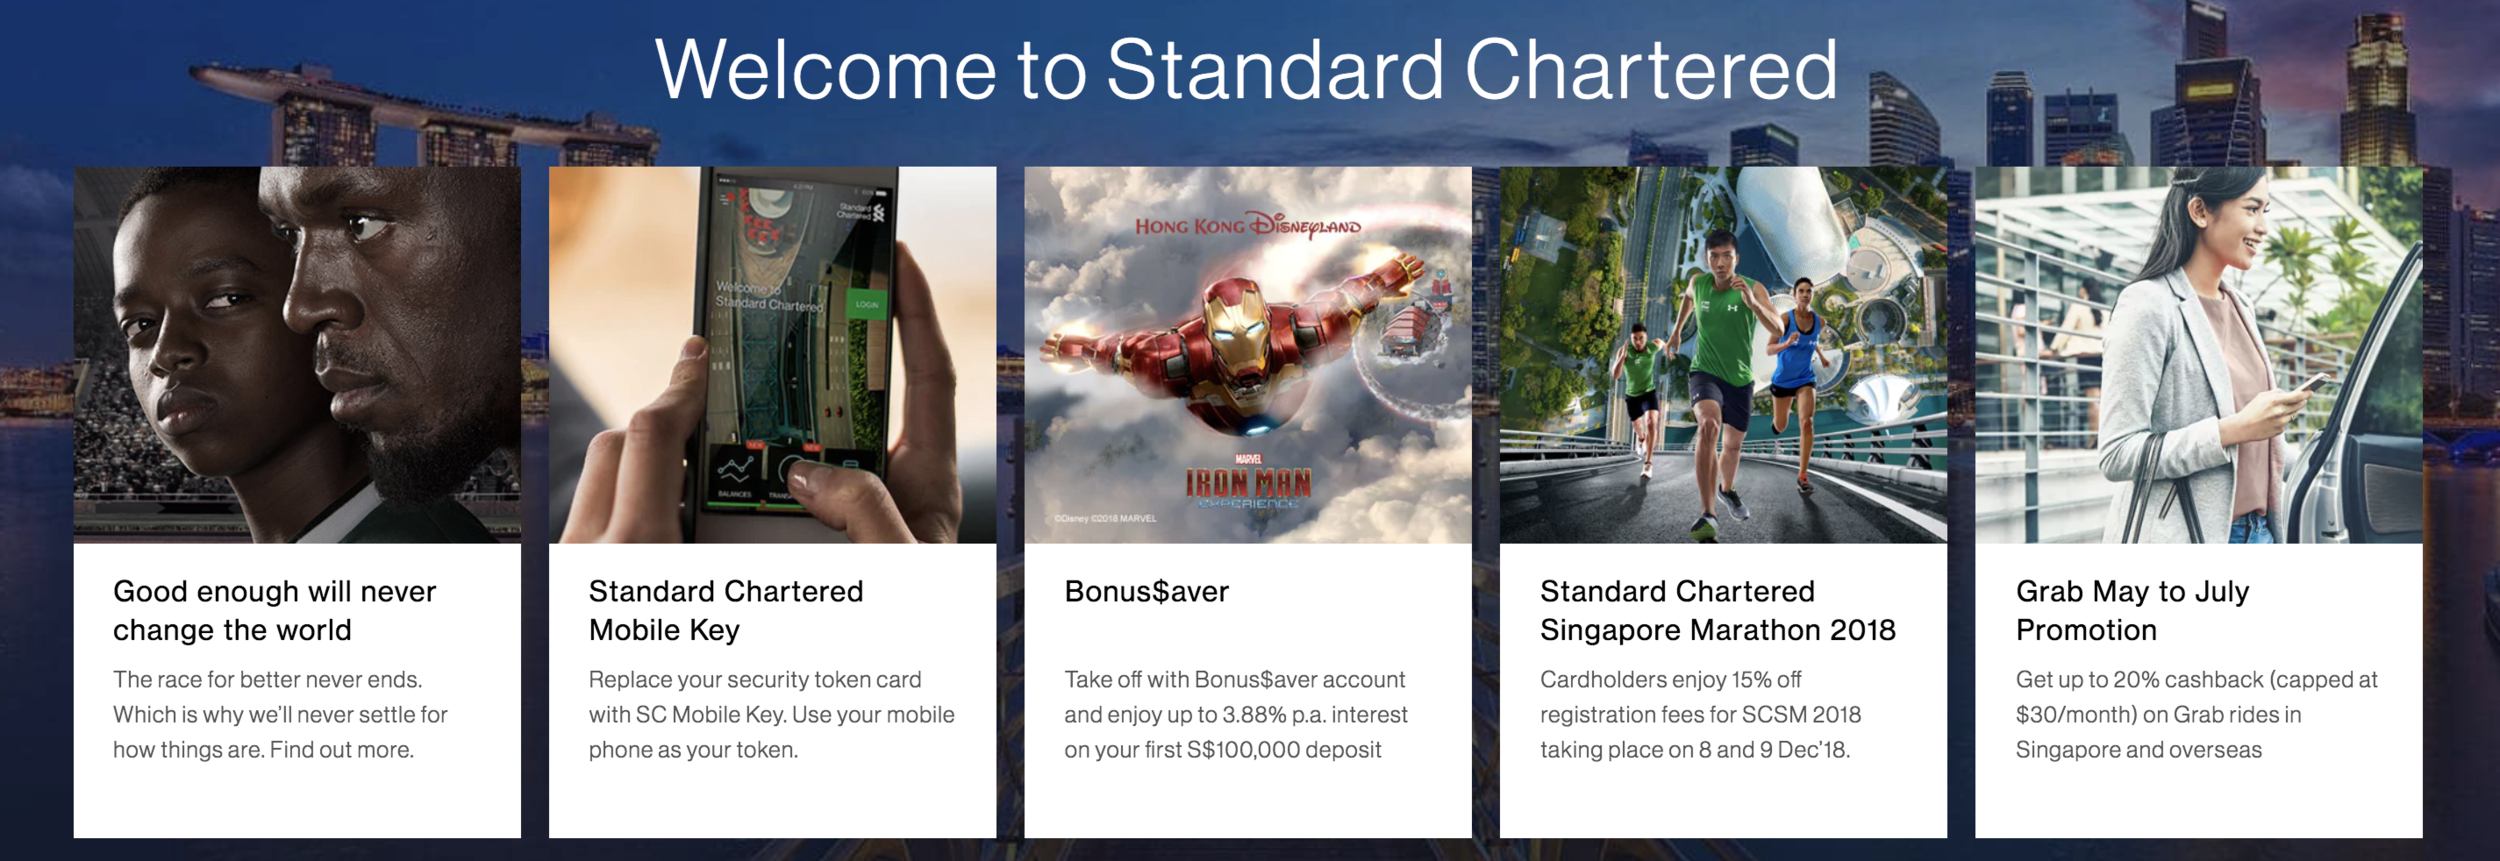 Photo Credit: Standard Chartered